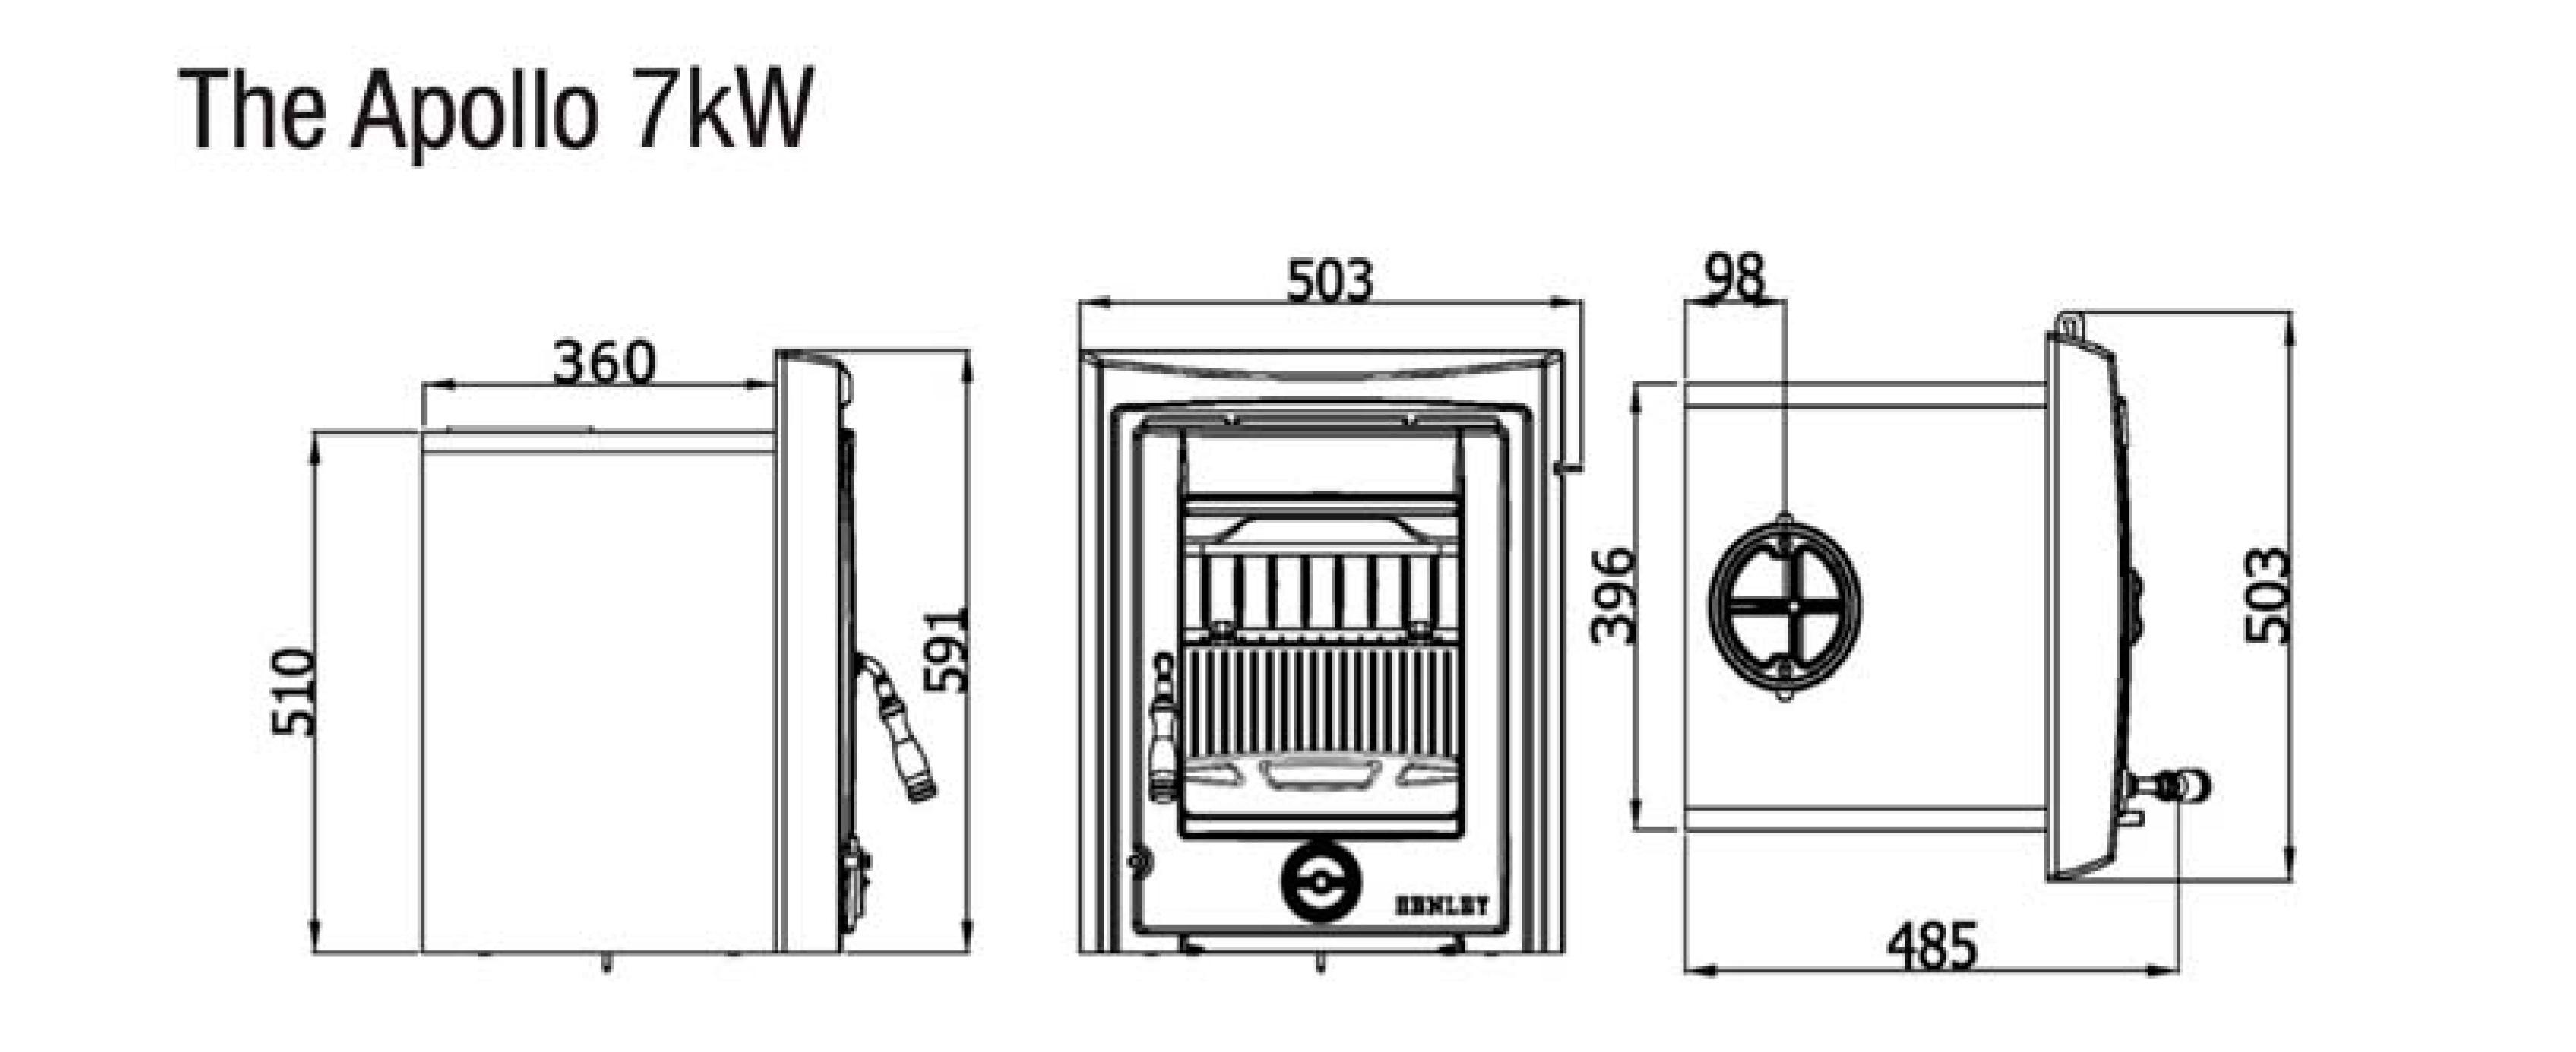 Henley Apollo 7 kw insert stove dimensions image